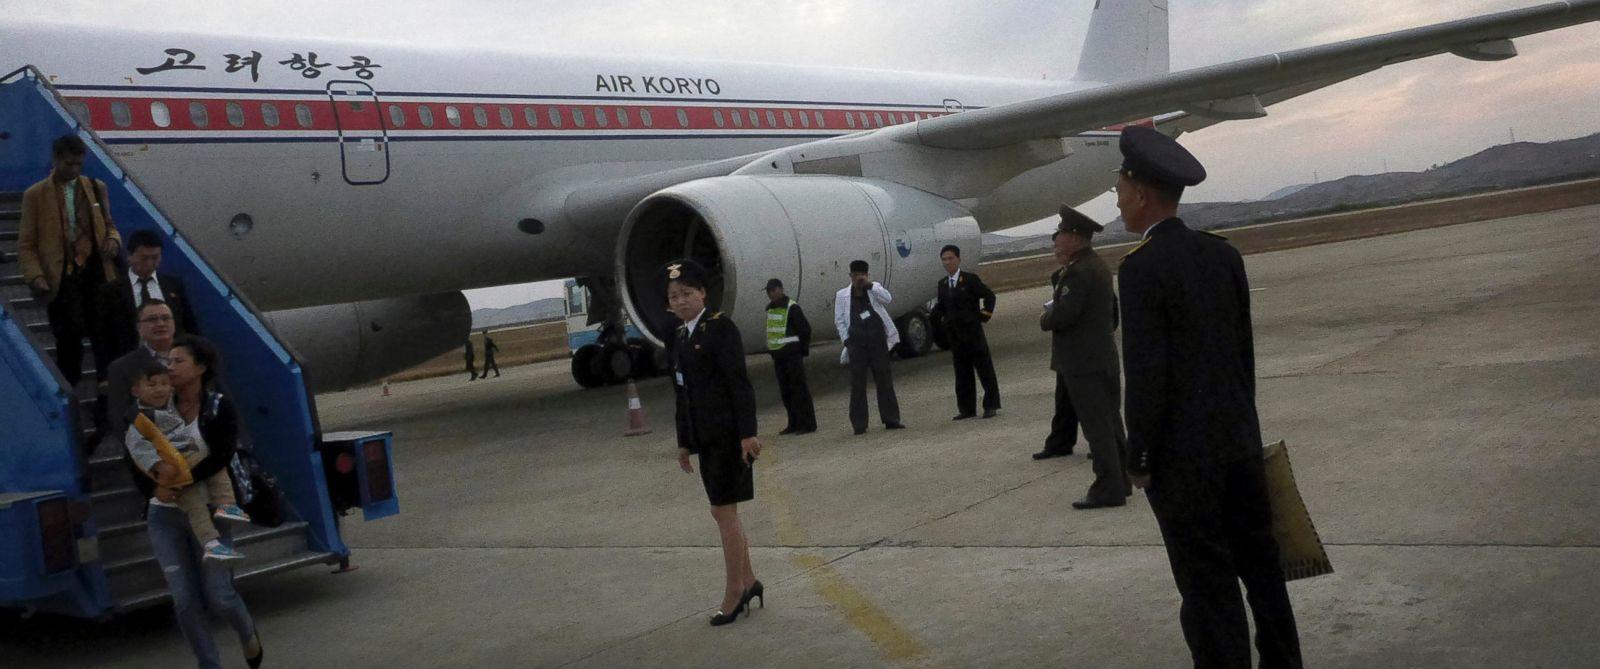 PHOTO: Passengers disembark an Air Koryo flight in Pyongyang, North Korea on Oct. 21, 2014.